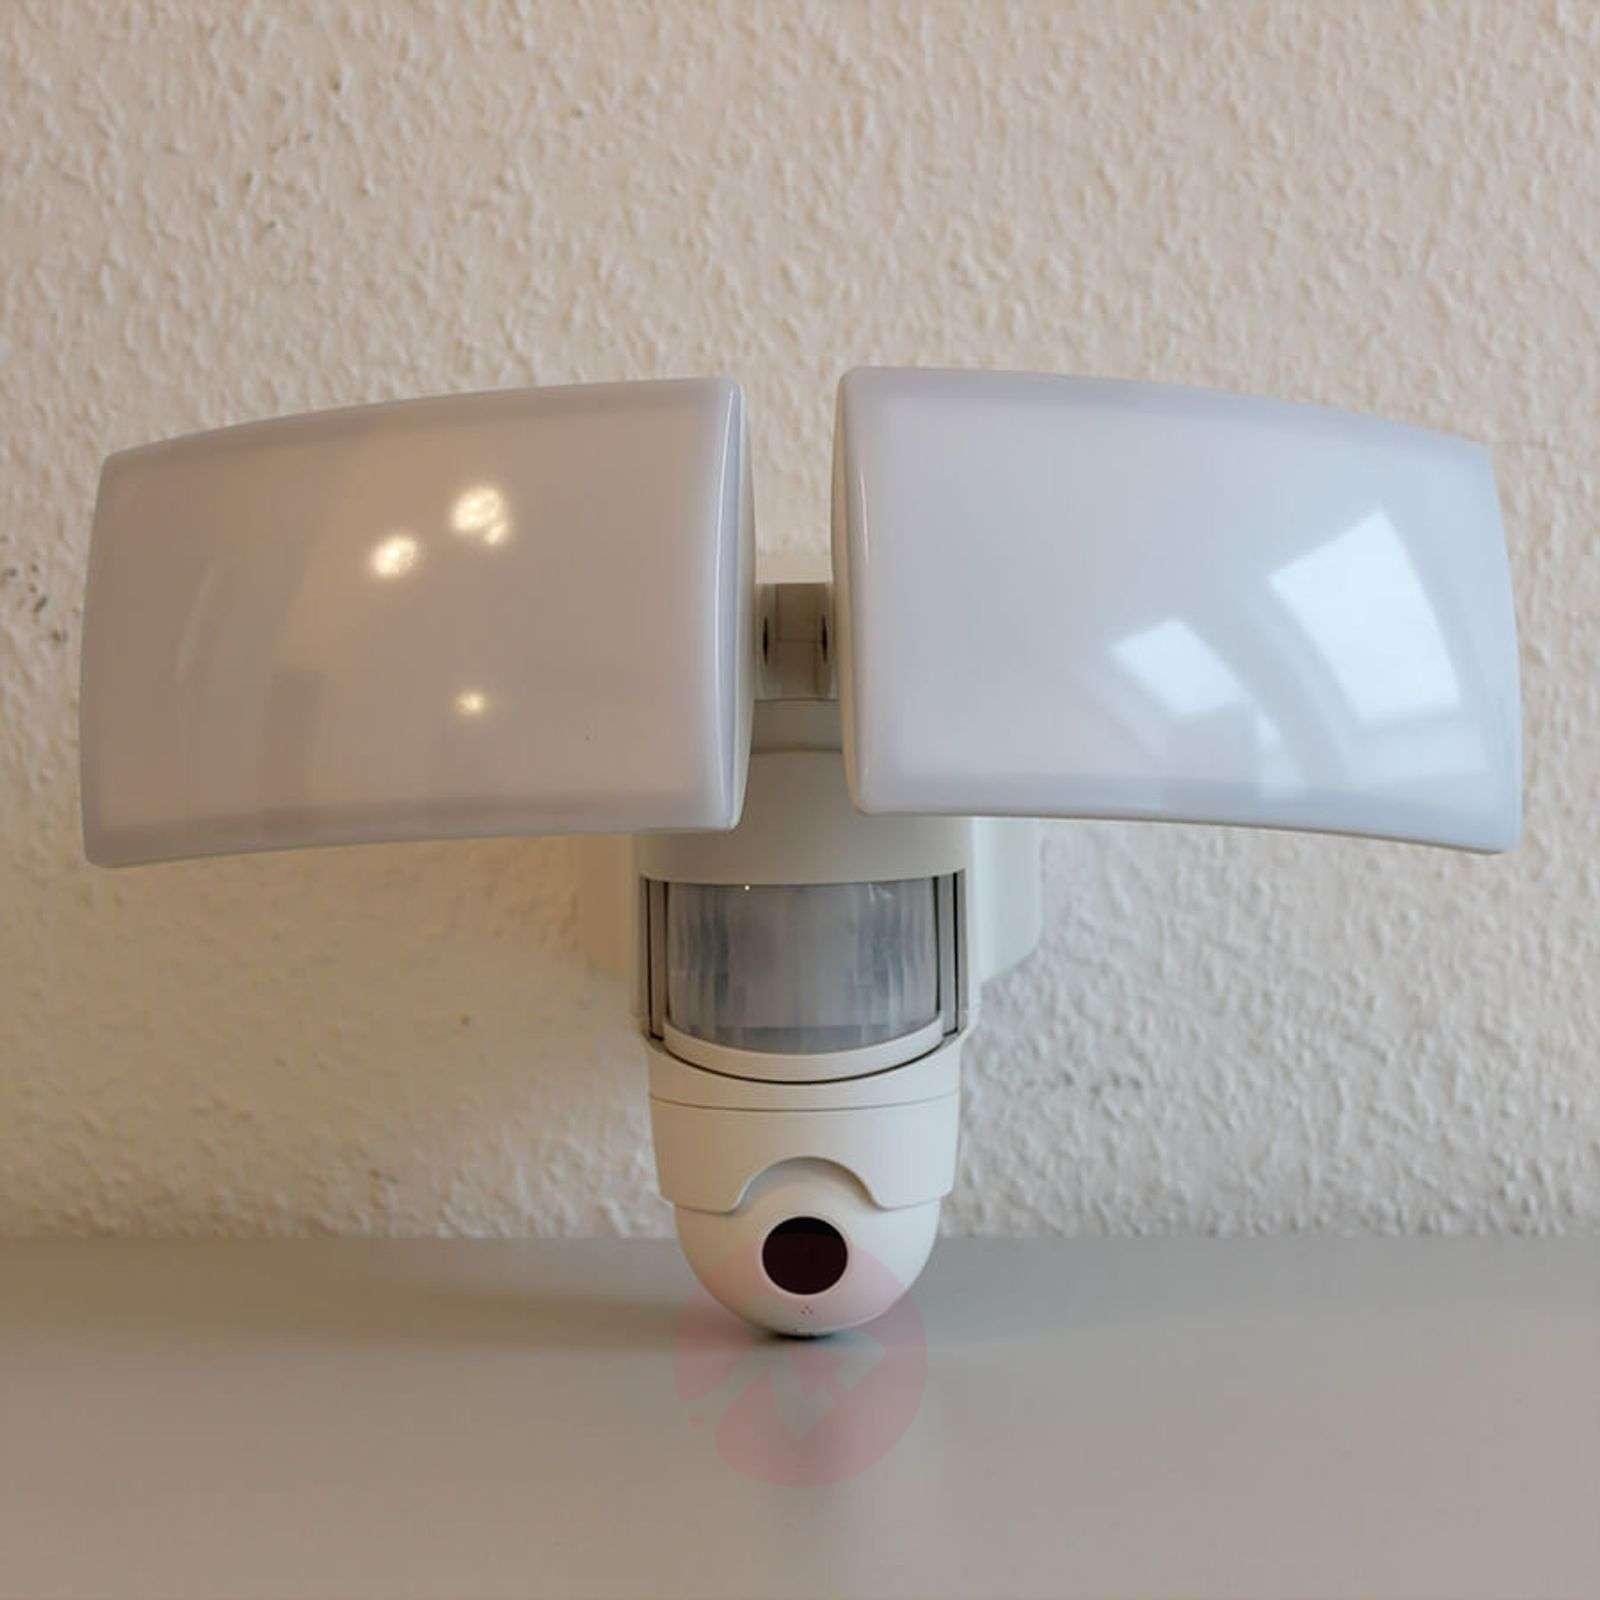 LED-ulkoseinälamppu Libra Cam, kameralla-3006509-01